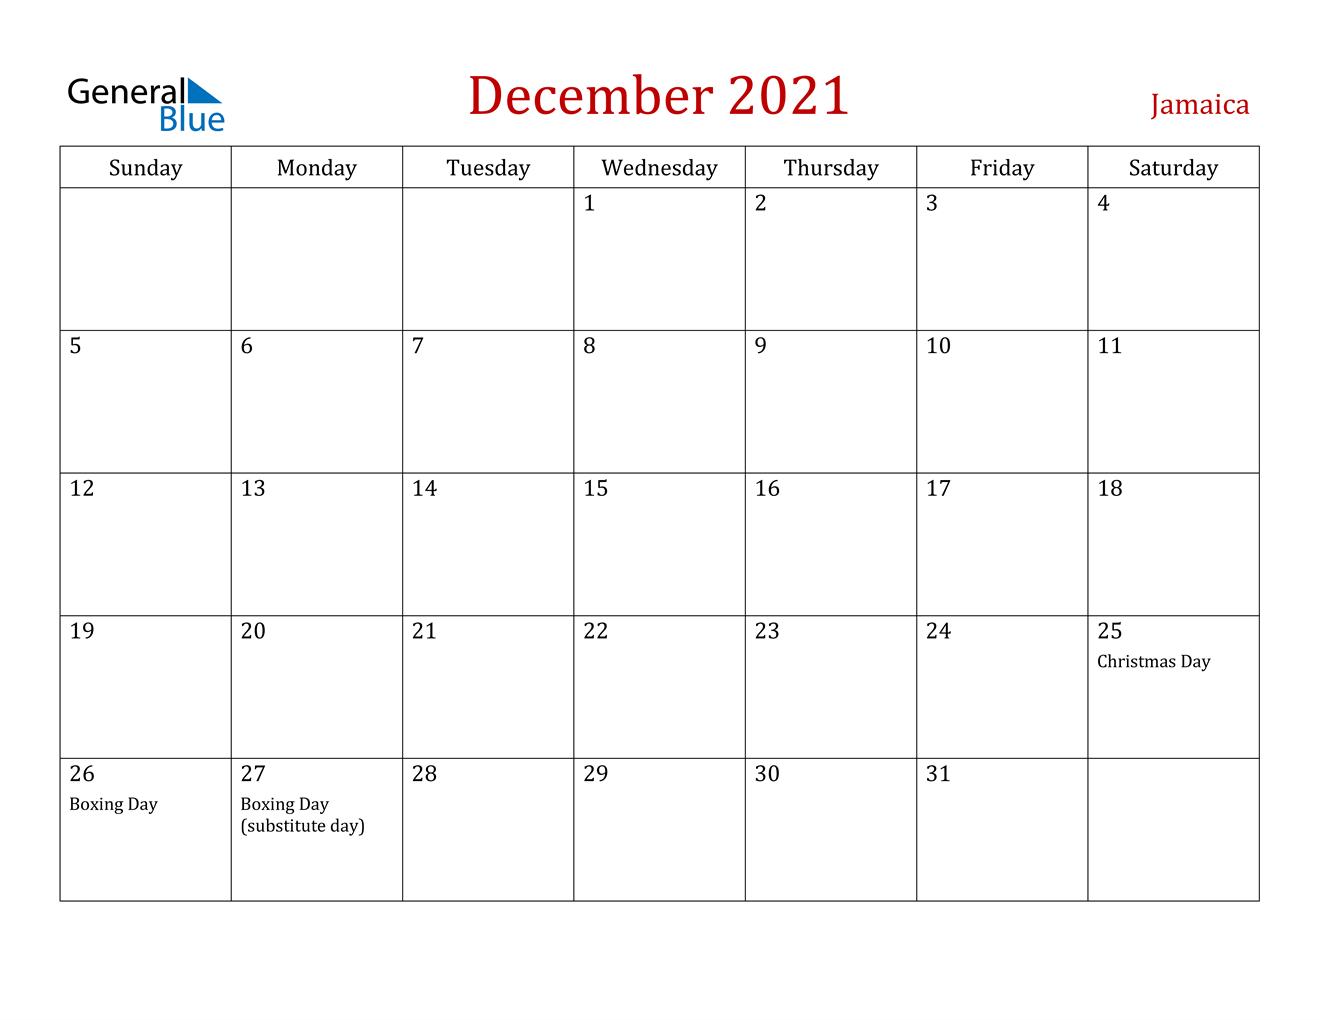 Jamaica December 2021 Calendar With Holidays